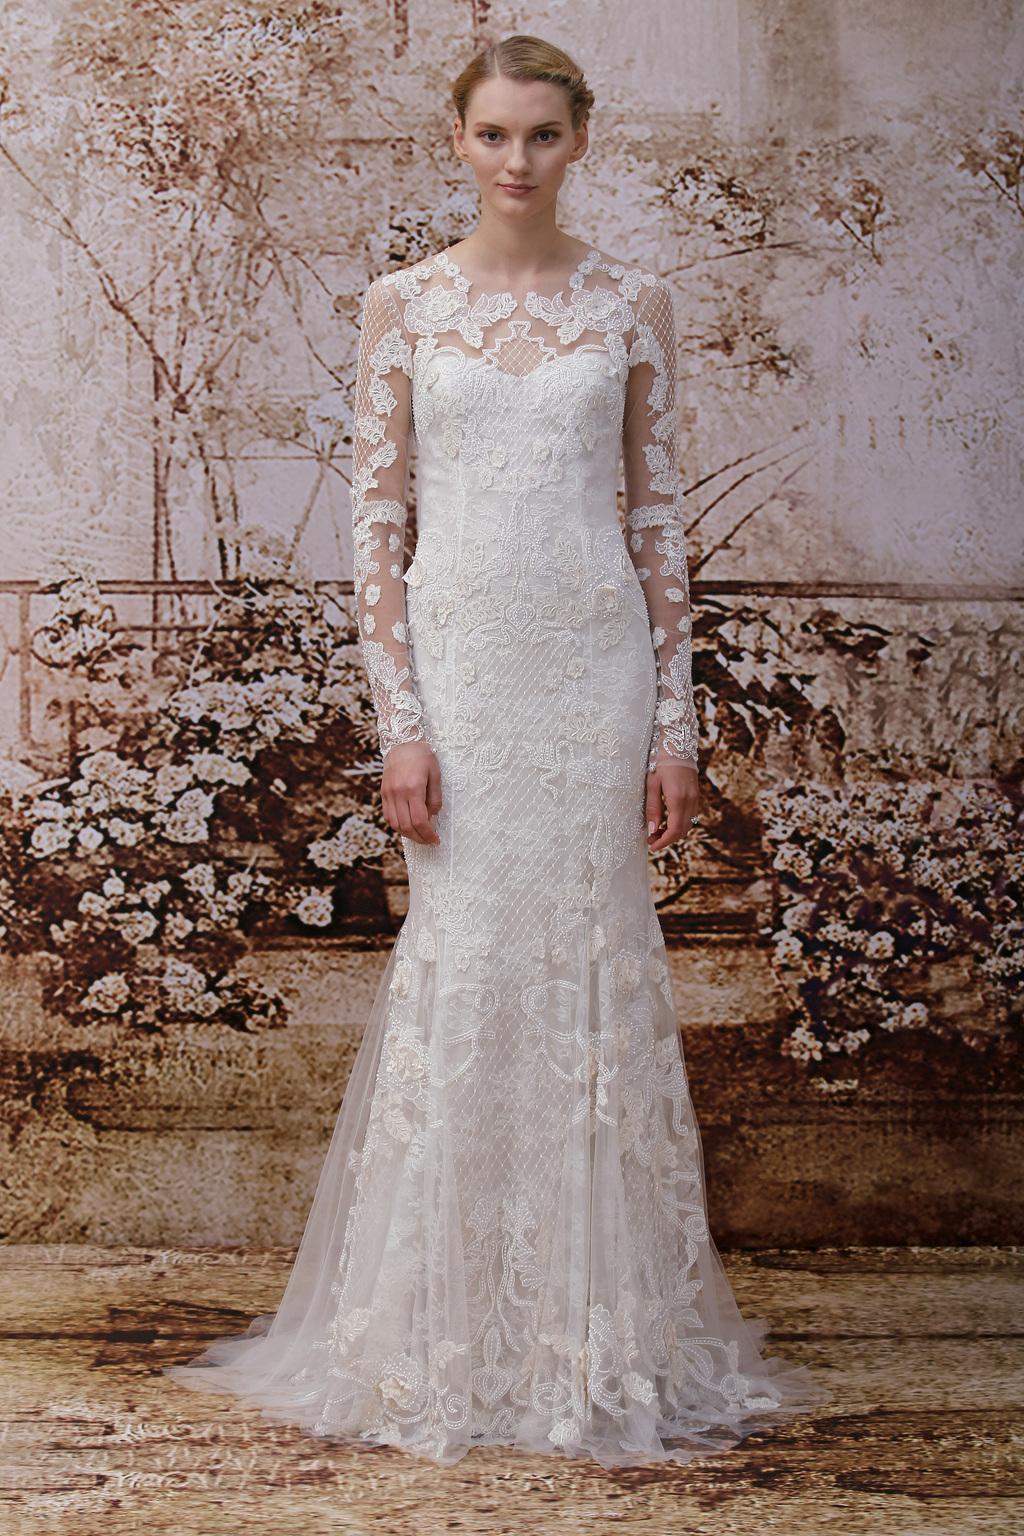 Monique-lhuillier-fall-2014-wedding-dress-look-16.full